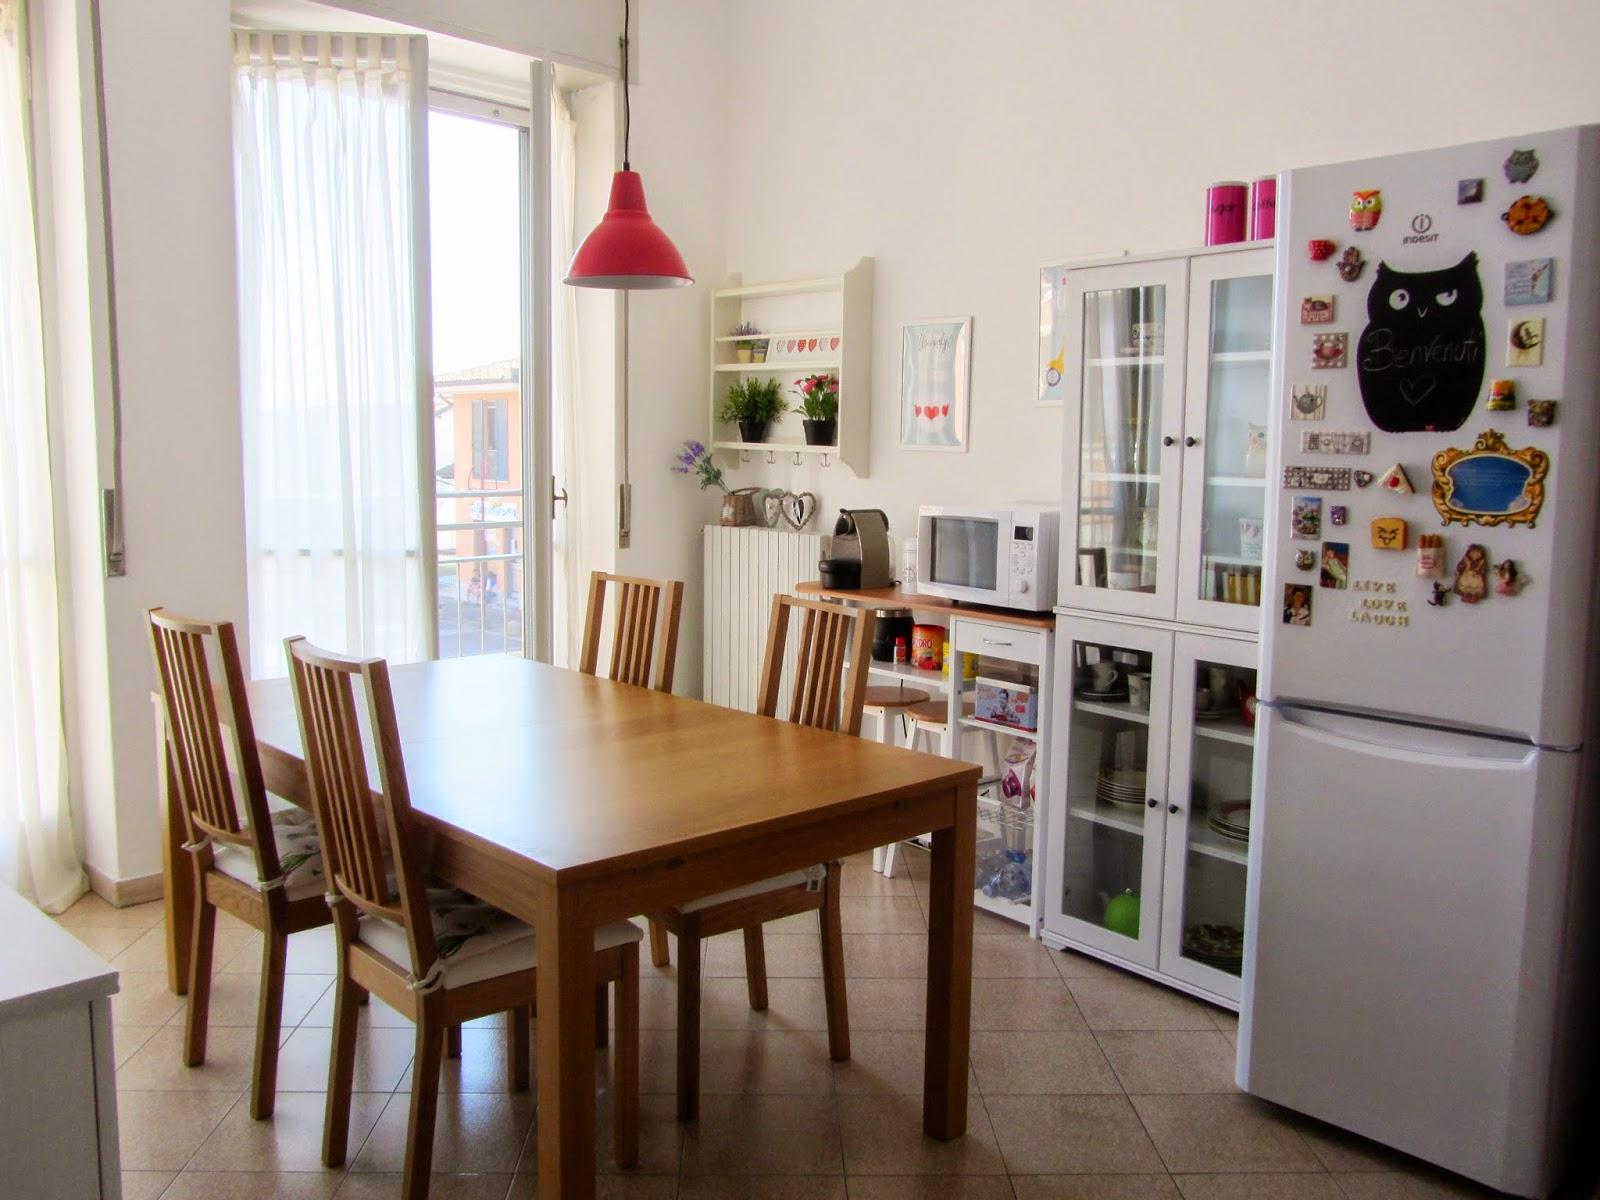 Fusa & Muffin: My Home Tour